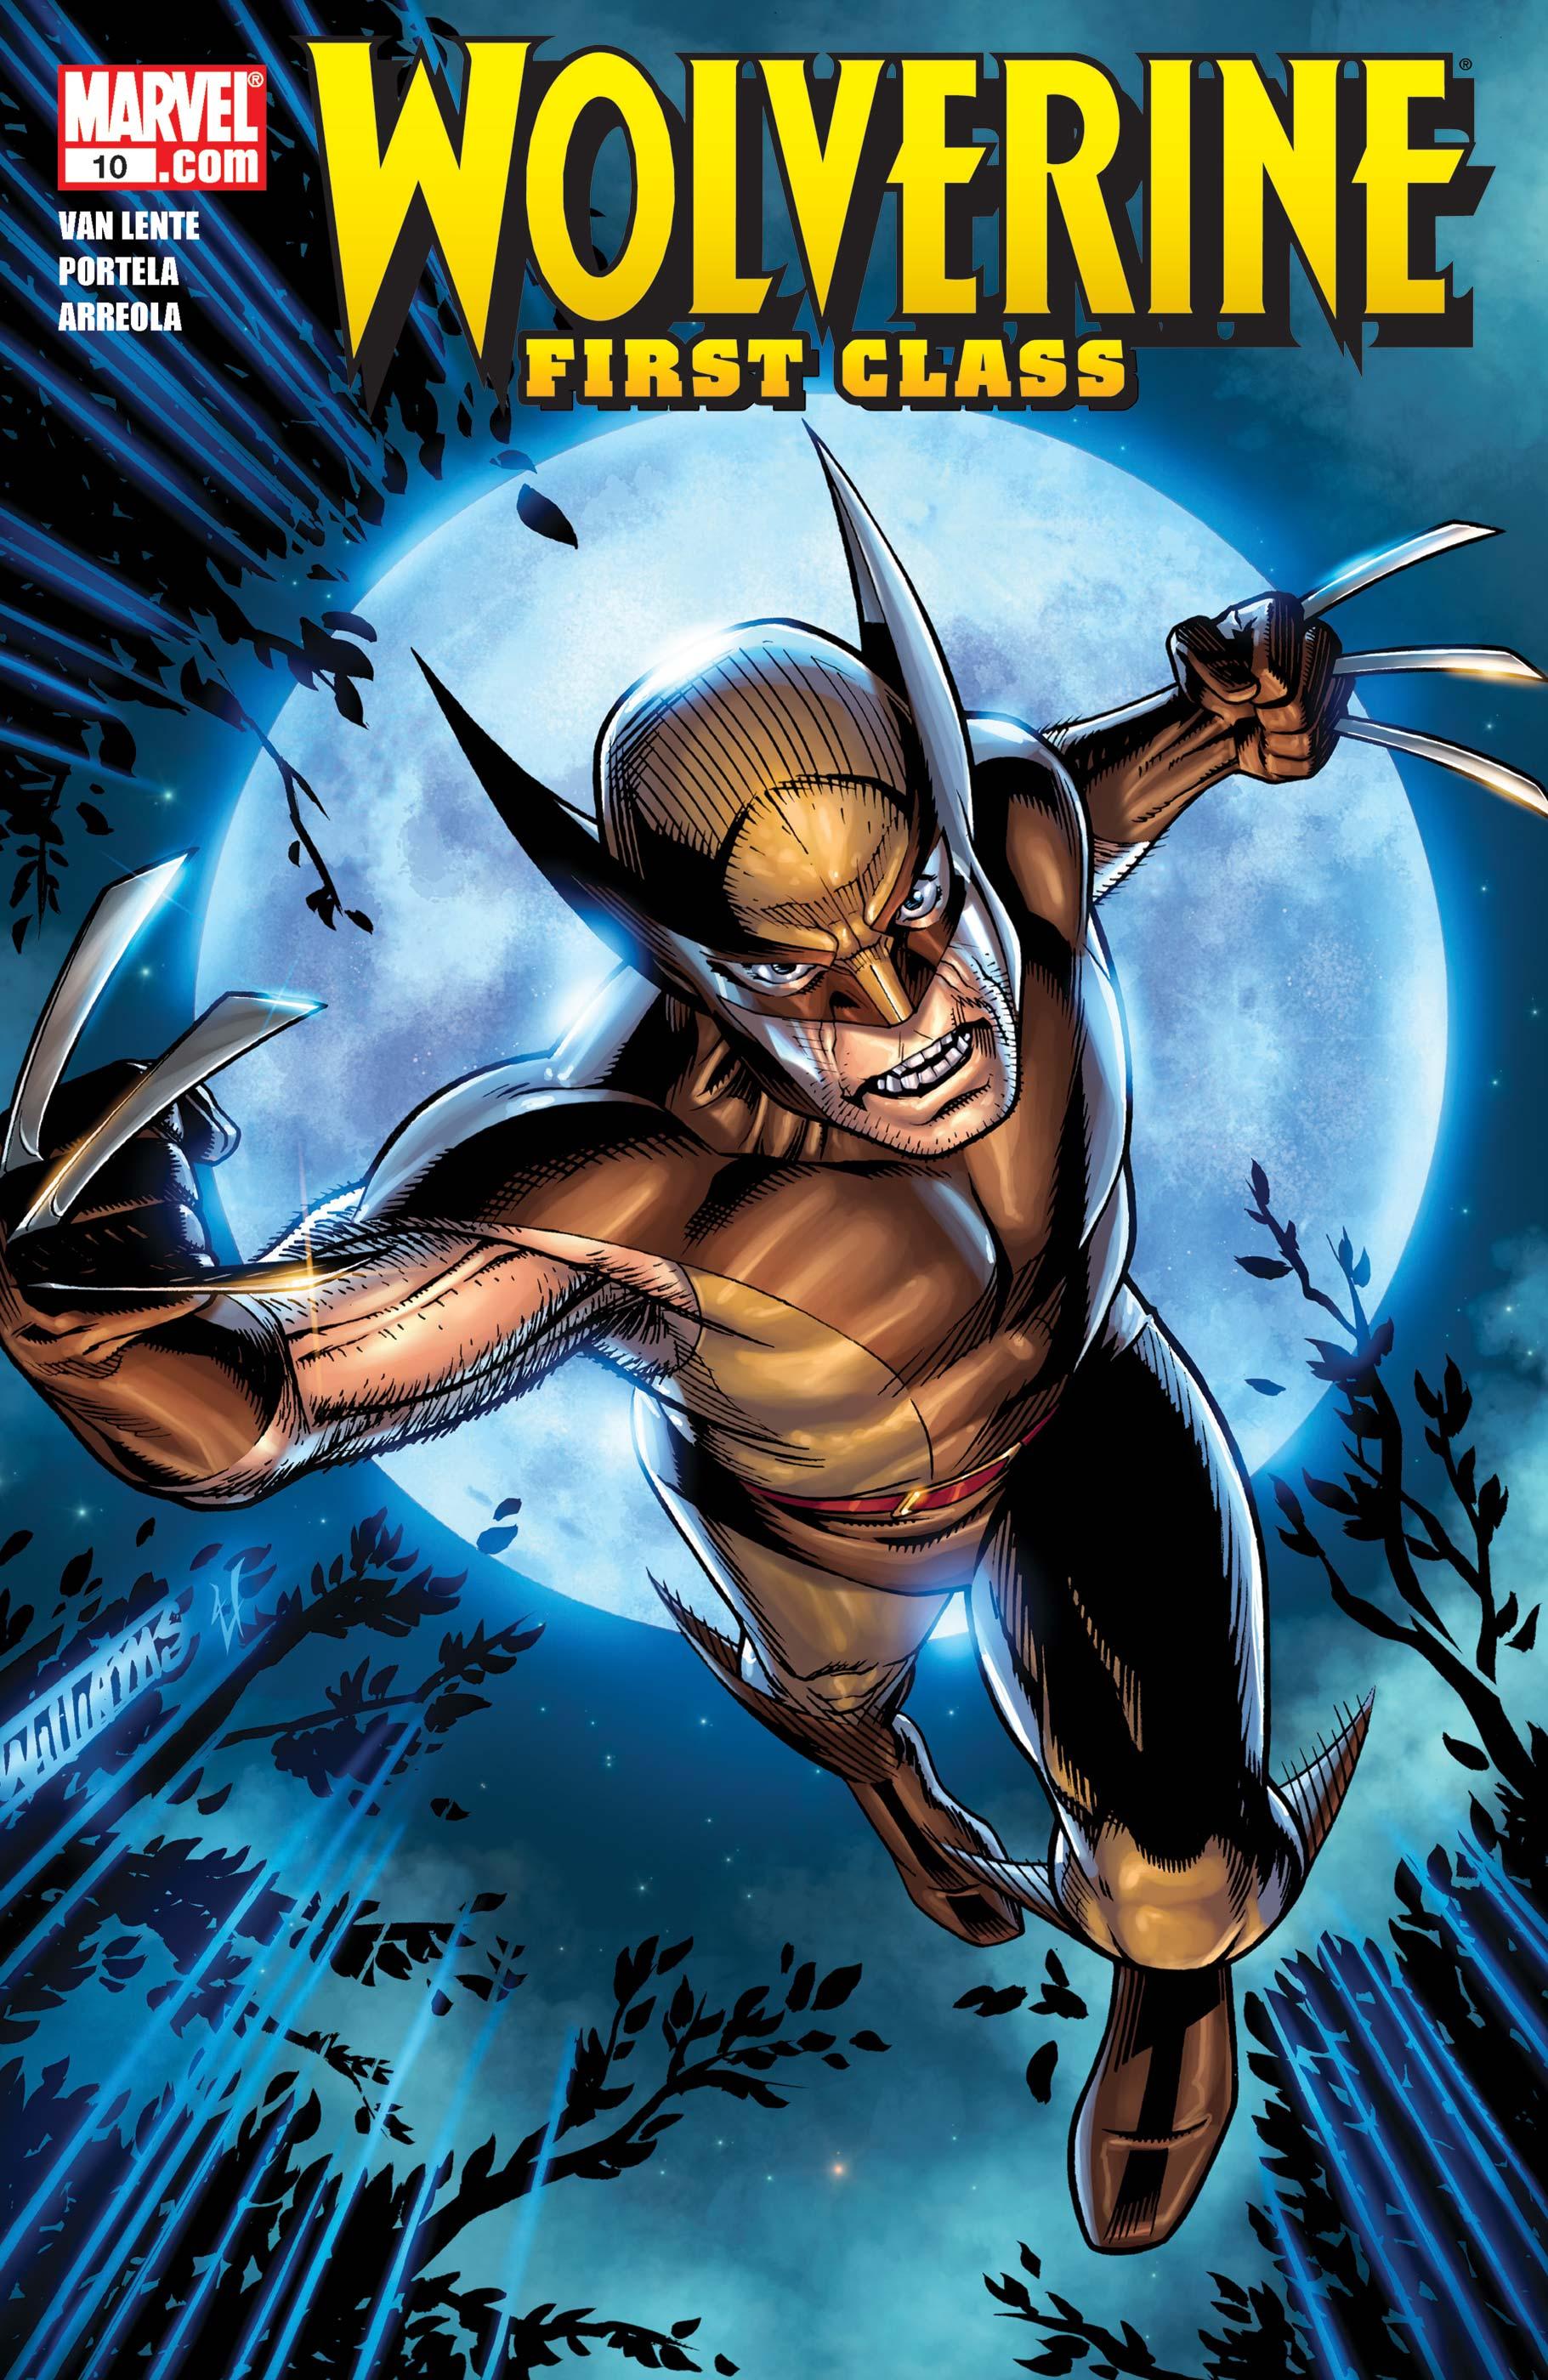 Wolverine: First Class (2008) #10